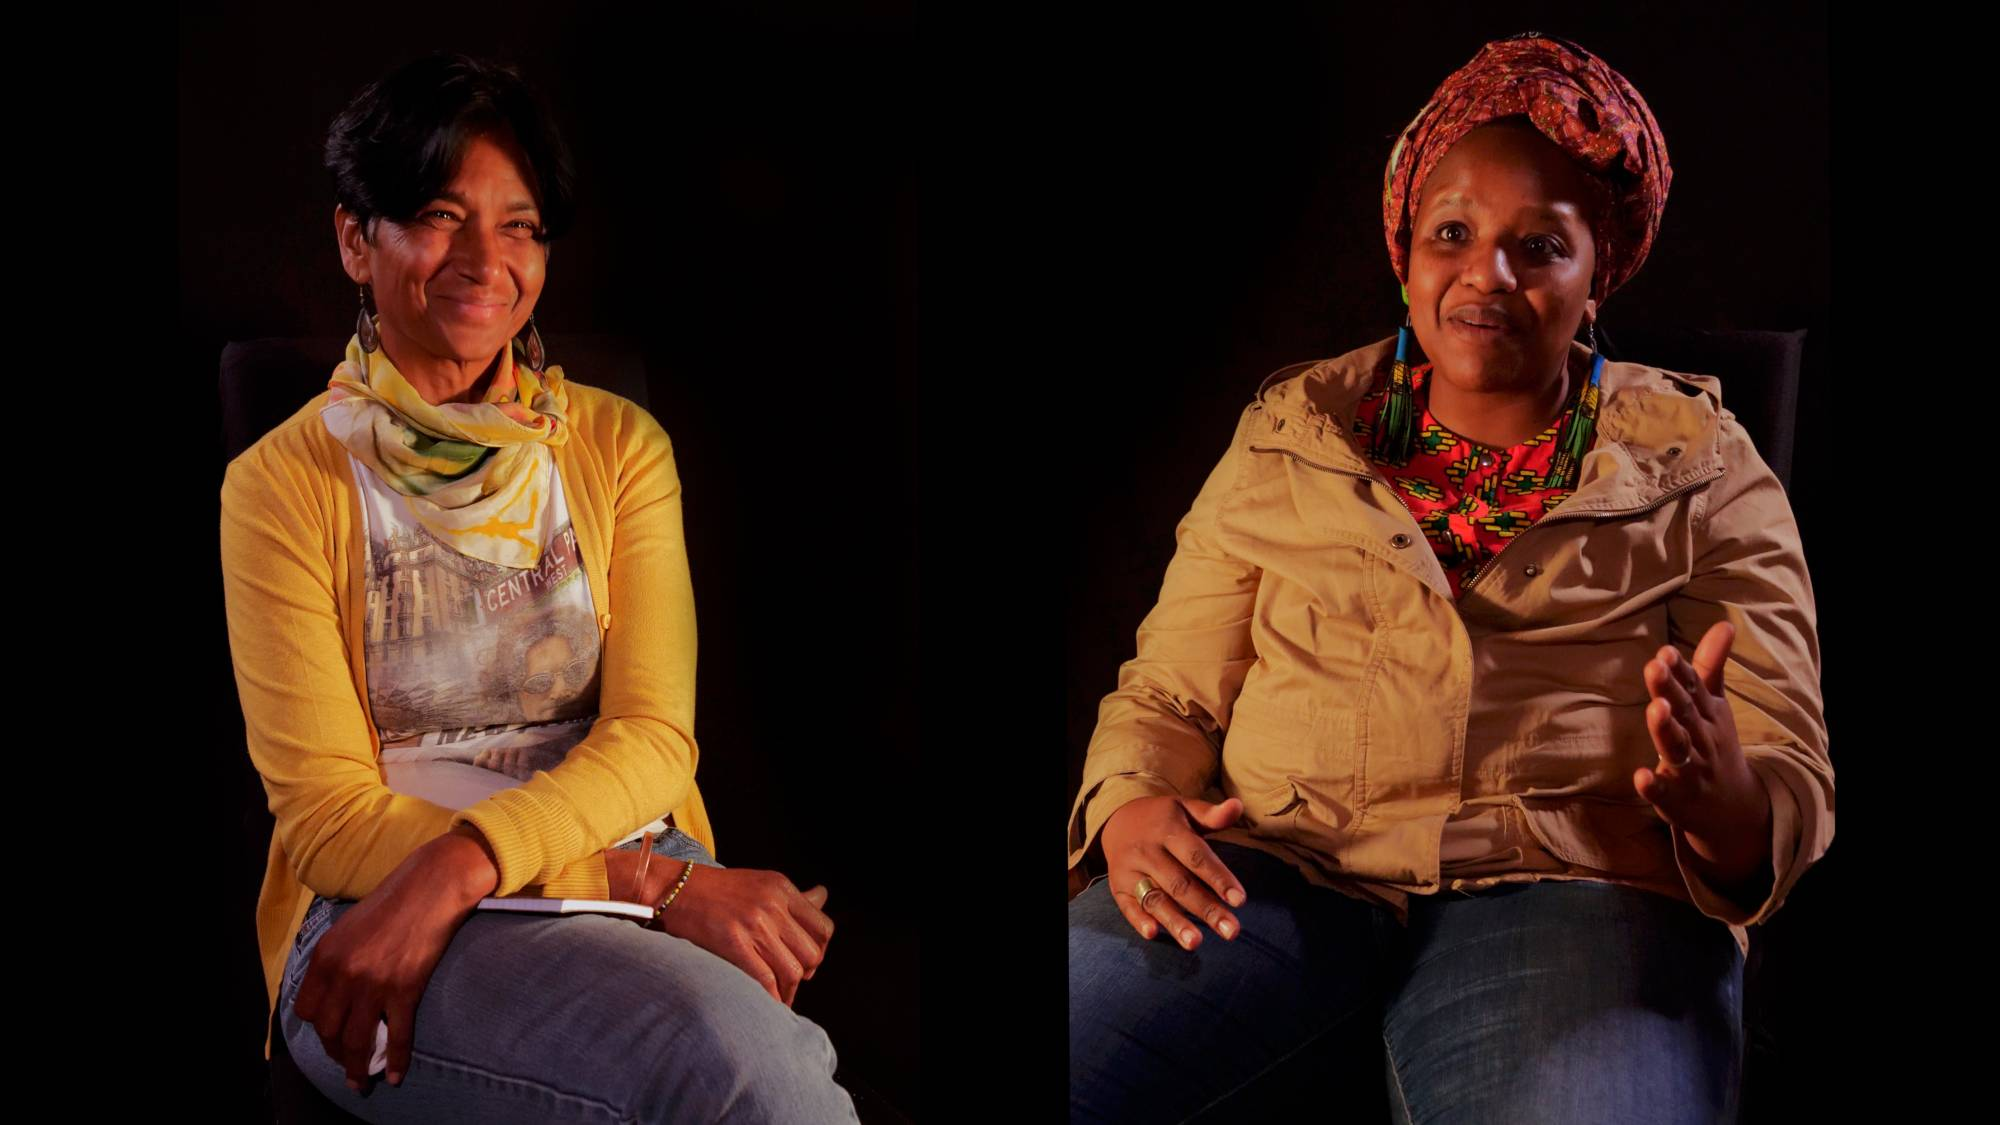 Sharon & Hlengiwe, Mageliesburg, South Africa, May 2018 (Videostill: Benno Seidel)